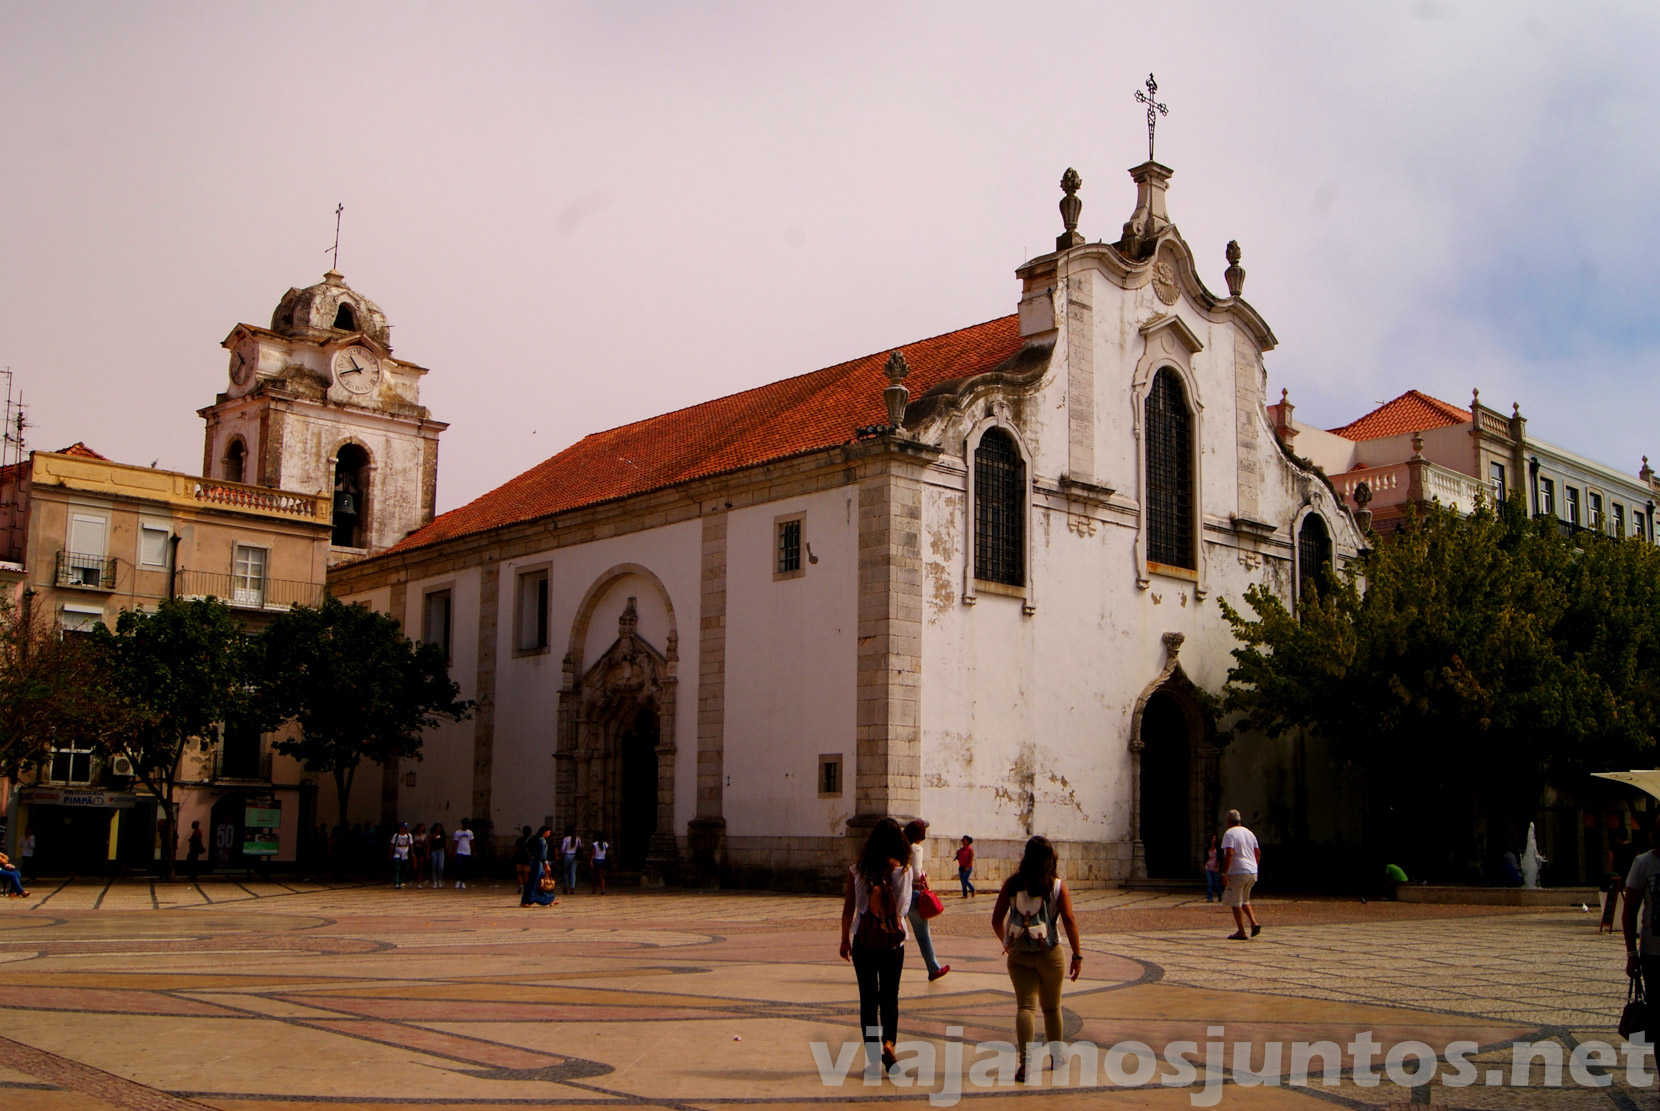 Iglesia central, Setubal, Portugal